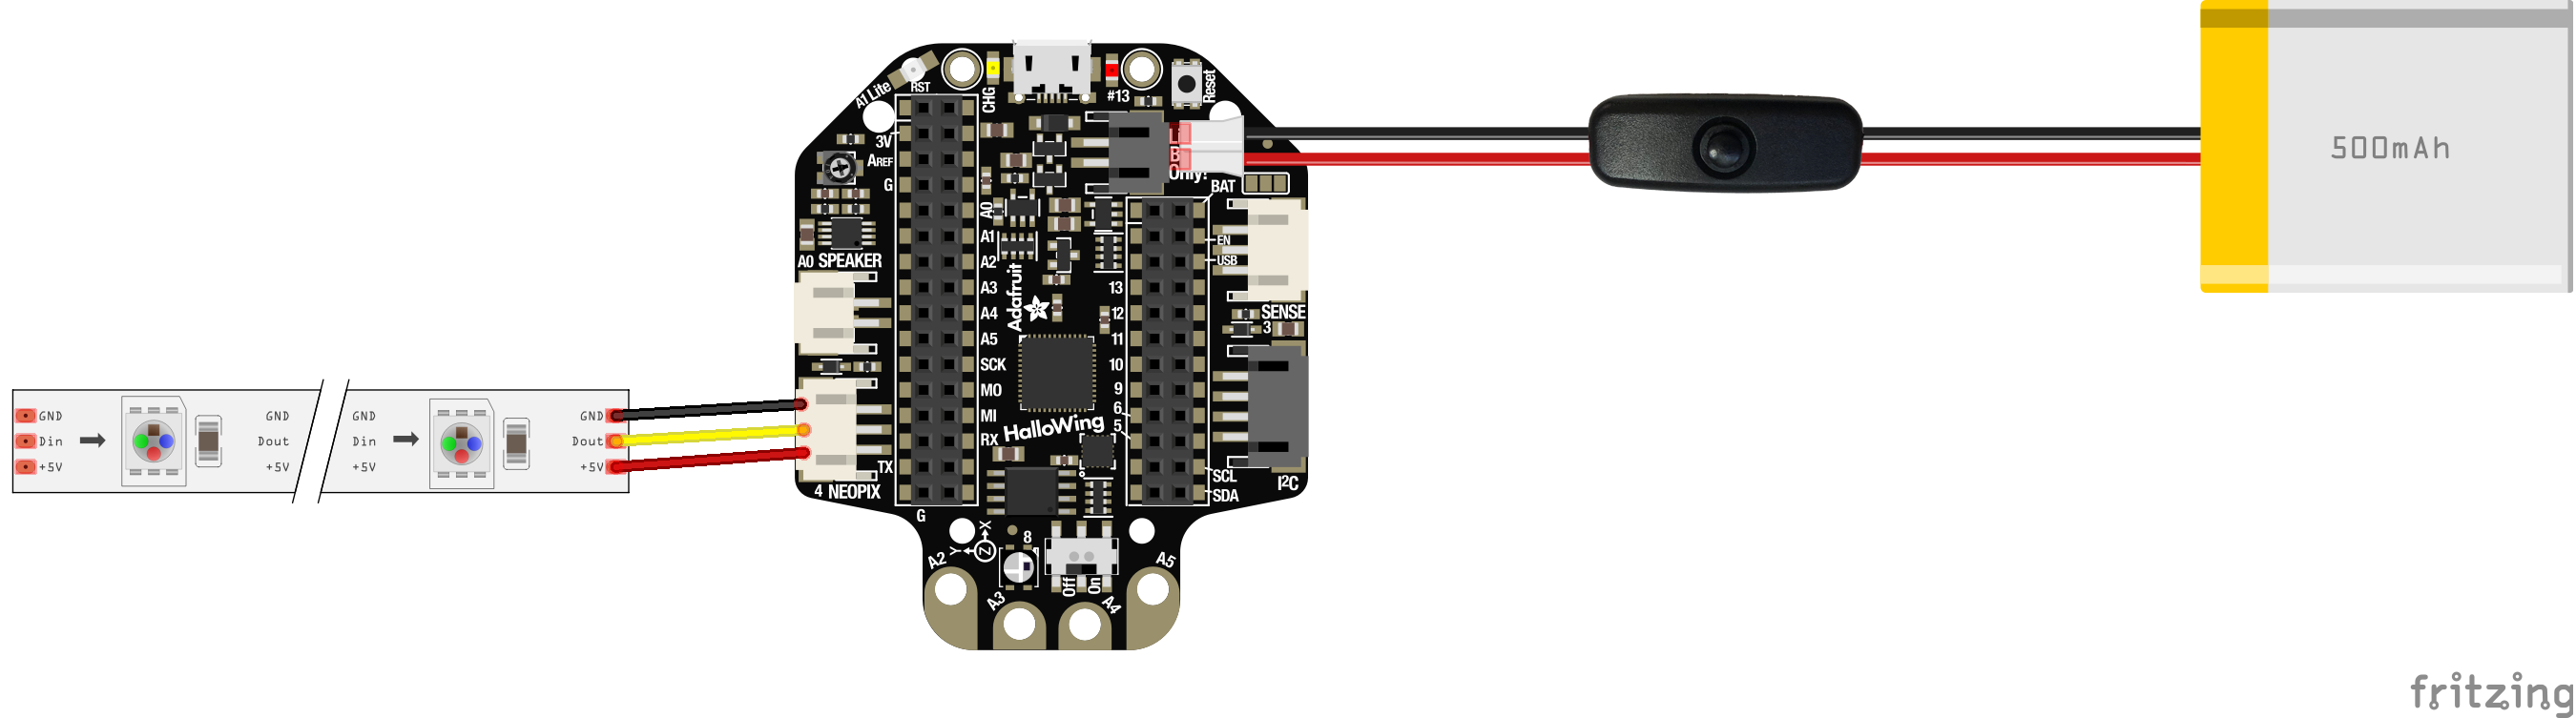 led_strips_wiring_diagram2.png